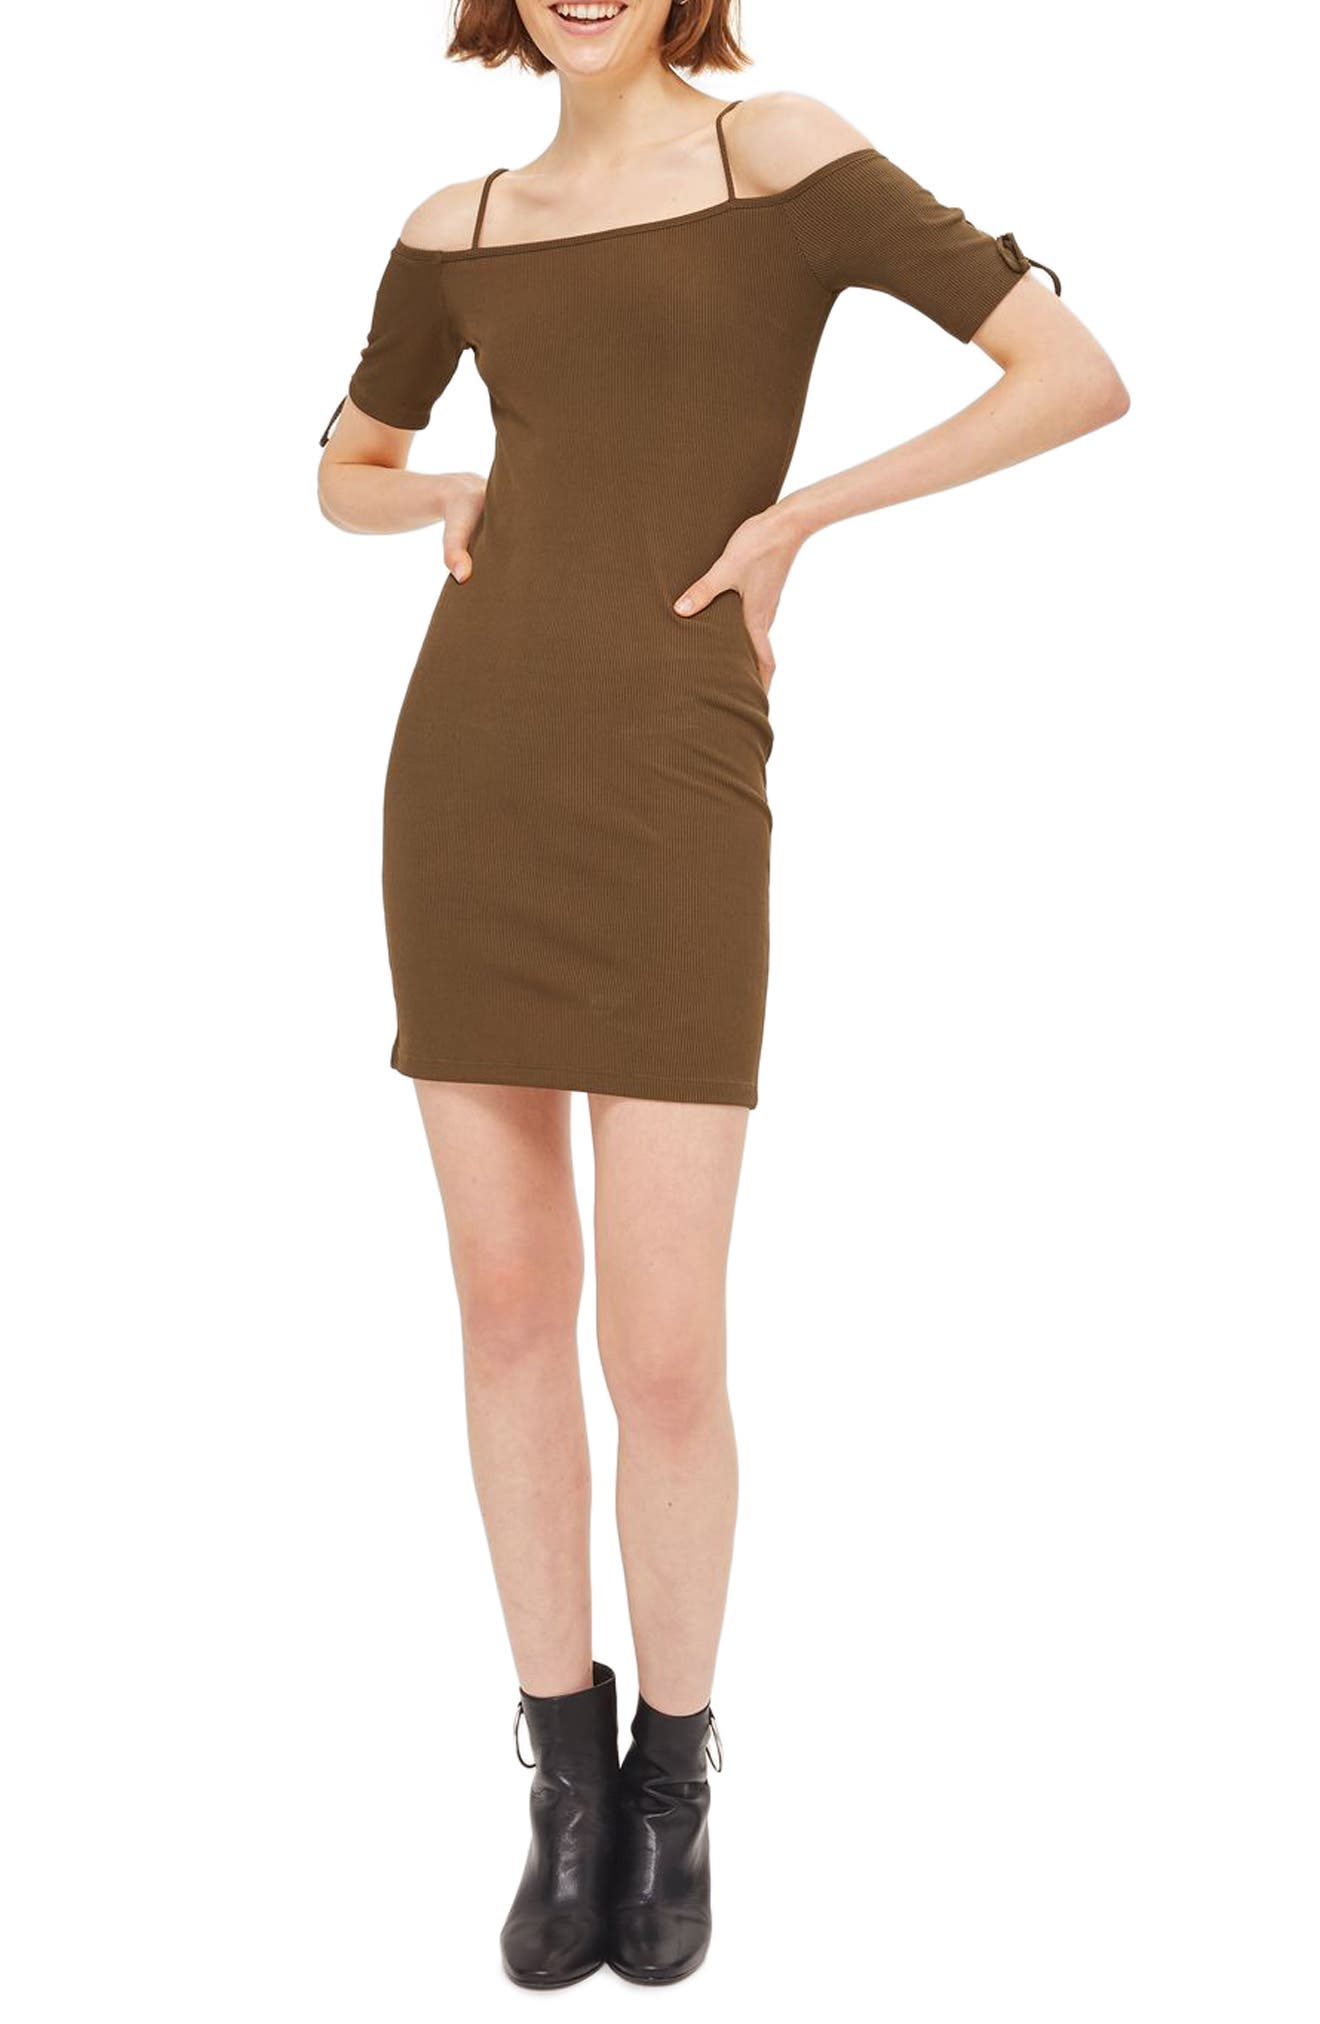 Topshop Bardot Lace-Up Sleeve Dress